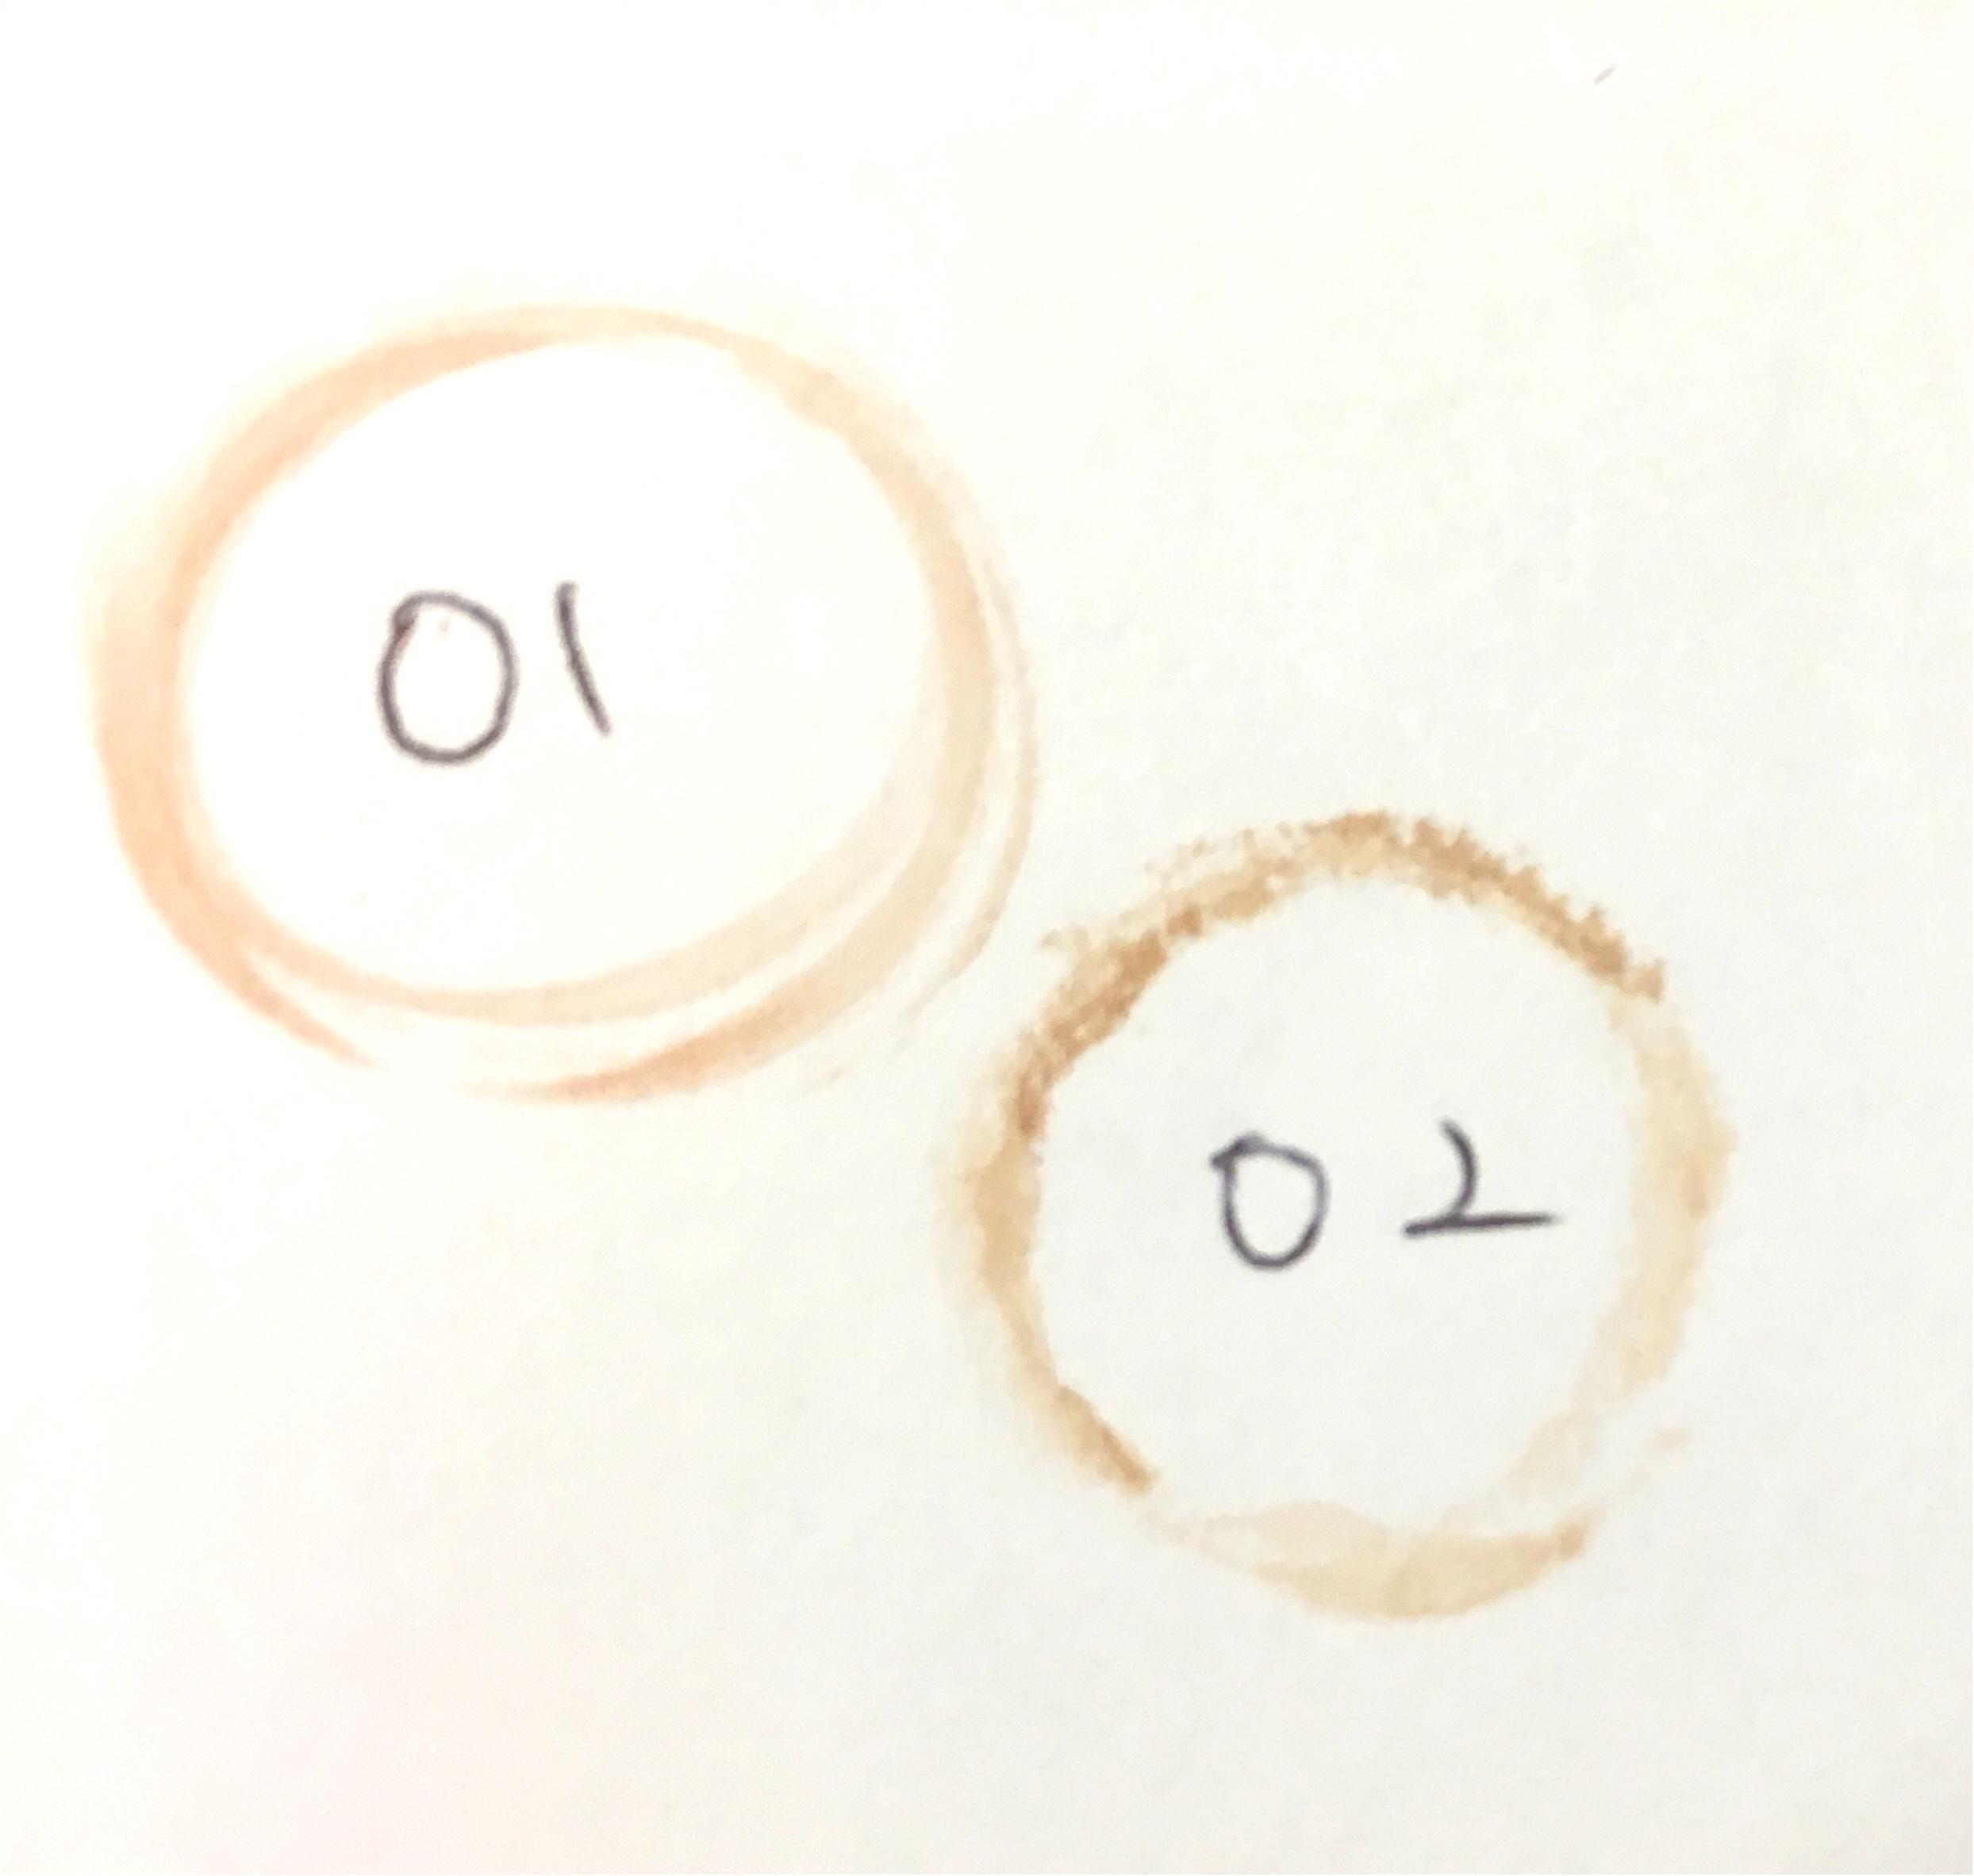 【CEZANNE(セザンヌ)】完売続出「塗るレフ板」!デパコスみたいな繊細パールの優秀ハイライト_5